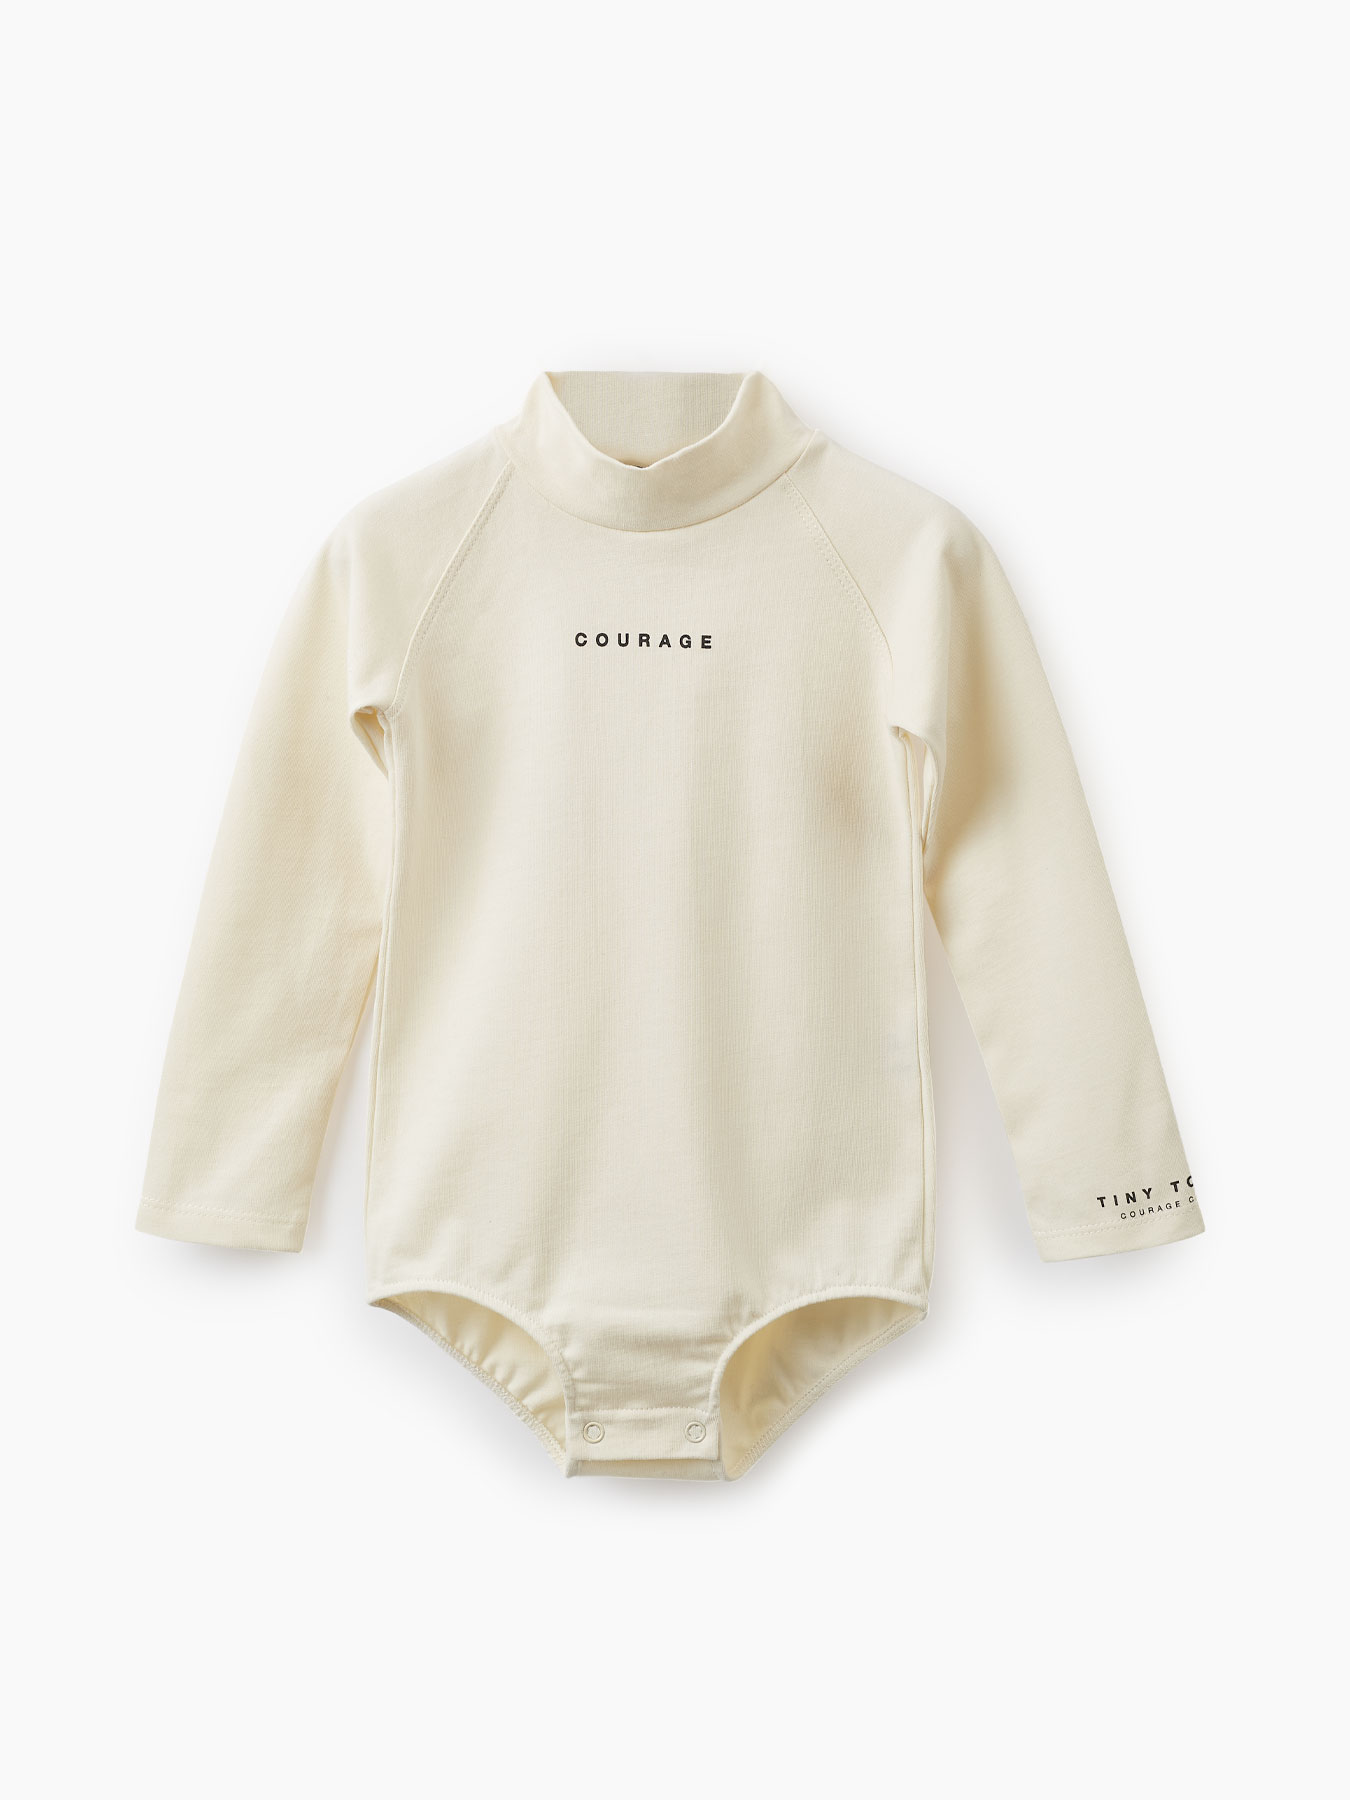 Купить 88087, Боди из хлопкового трикотажа (milky, 86) Happy Baby бежевый 86,